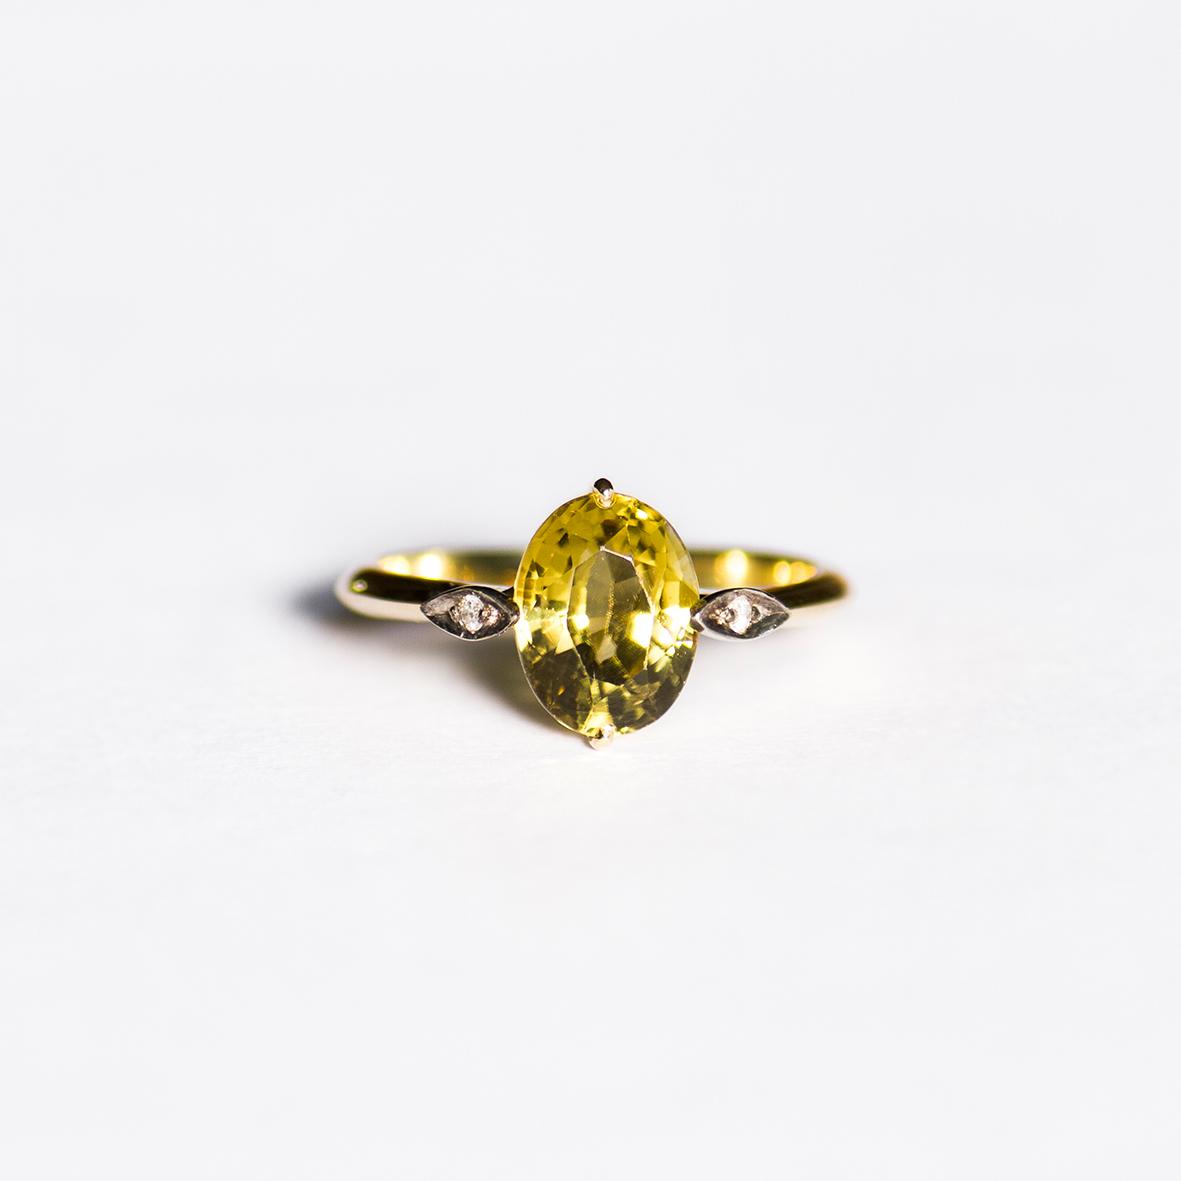 5. OONA_gems of ceylon_principal_sinhalite ring